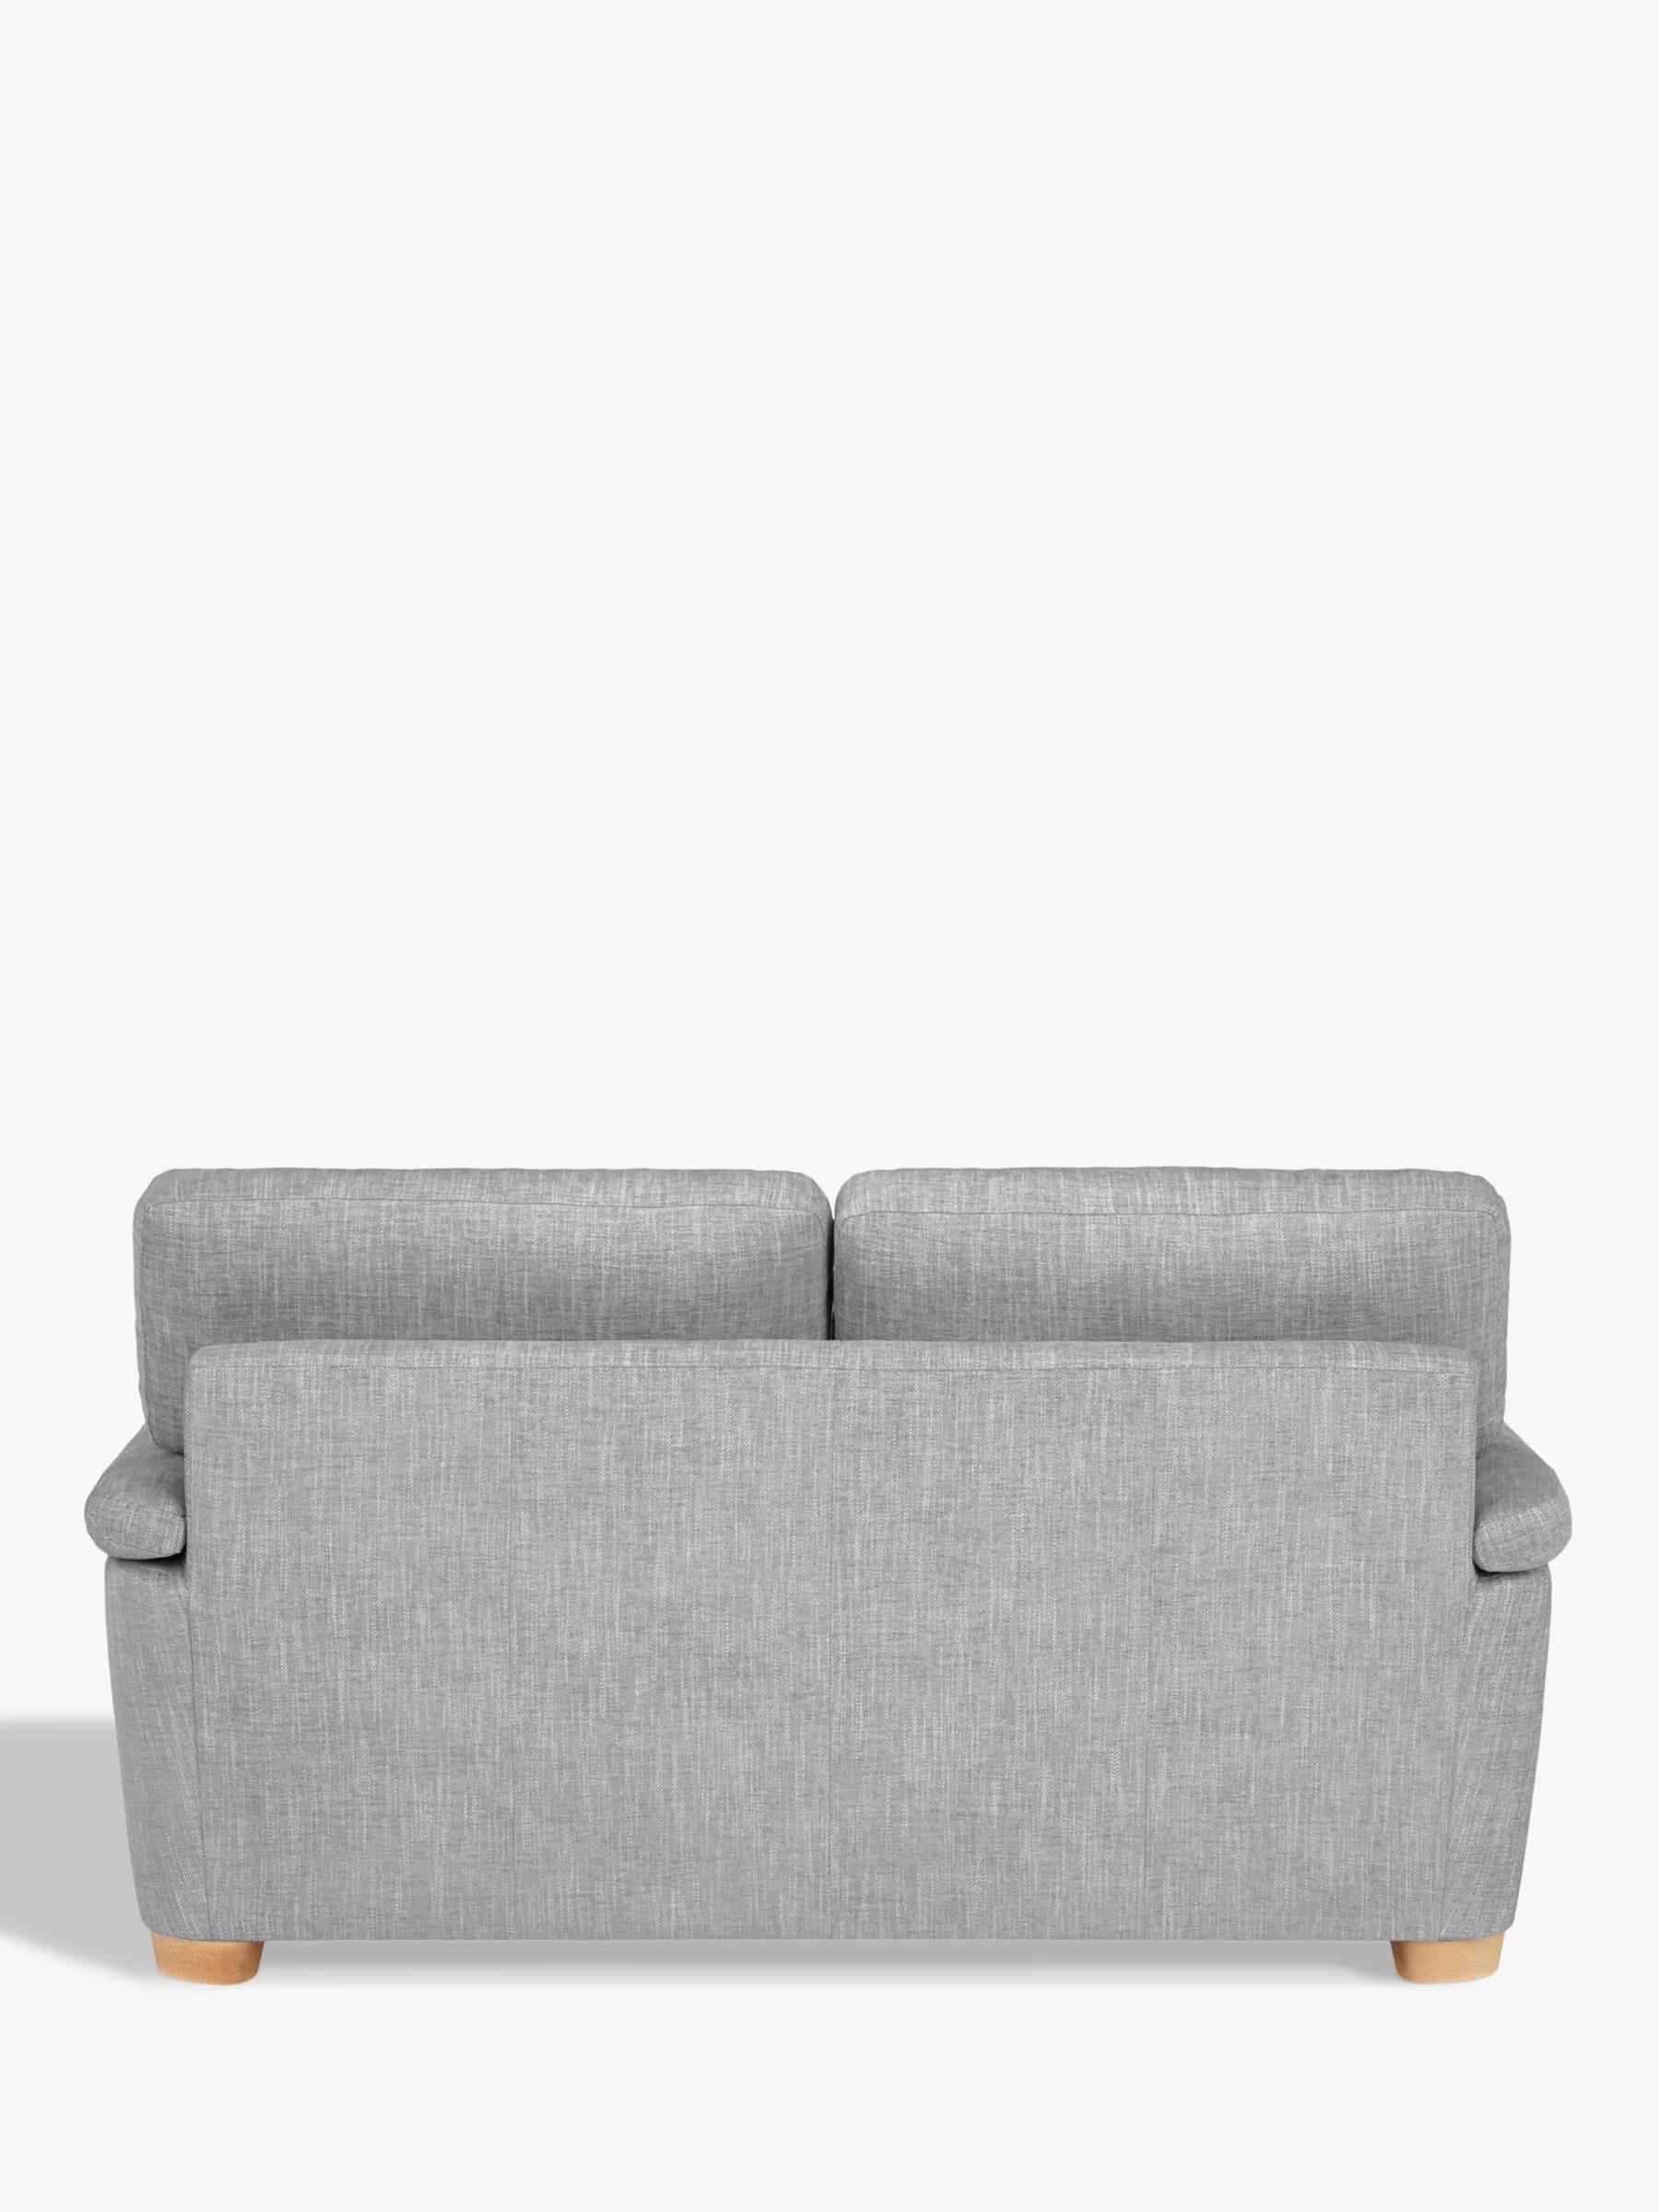 camden sofa john lewis beds darwin nt energywarden